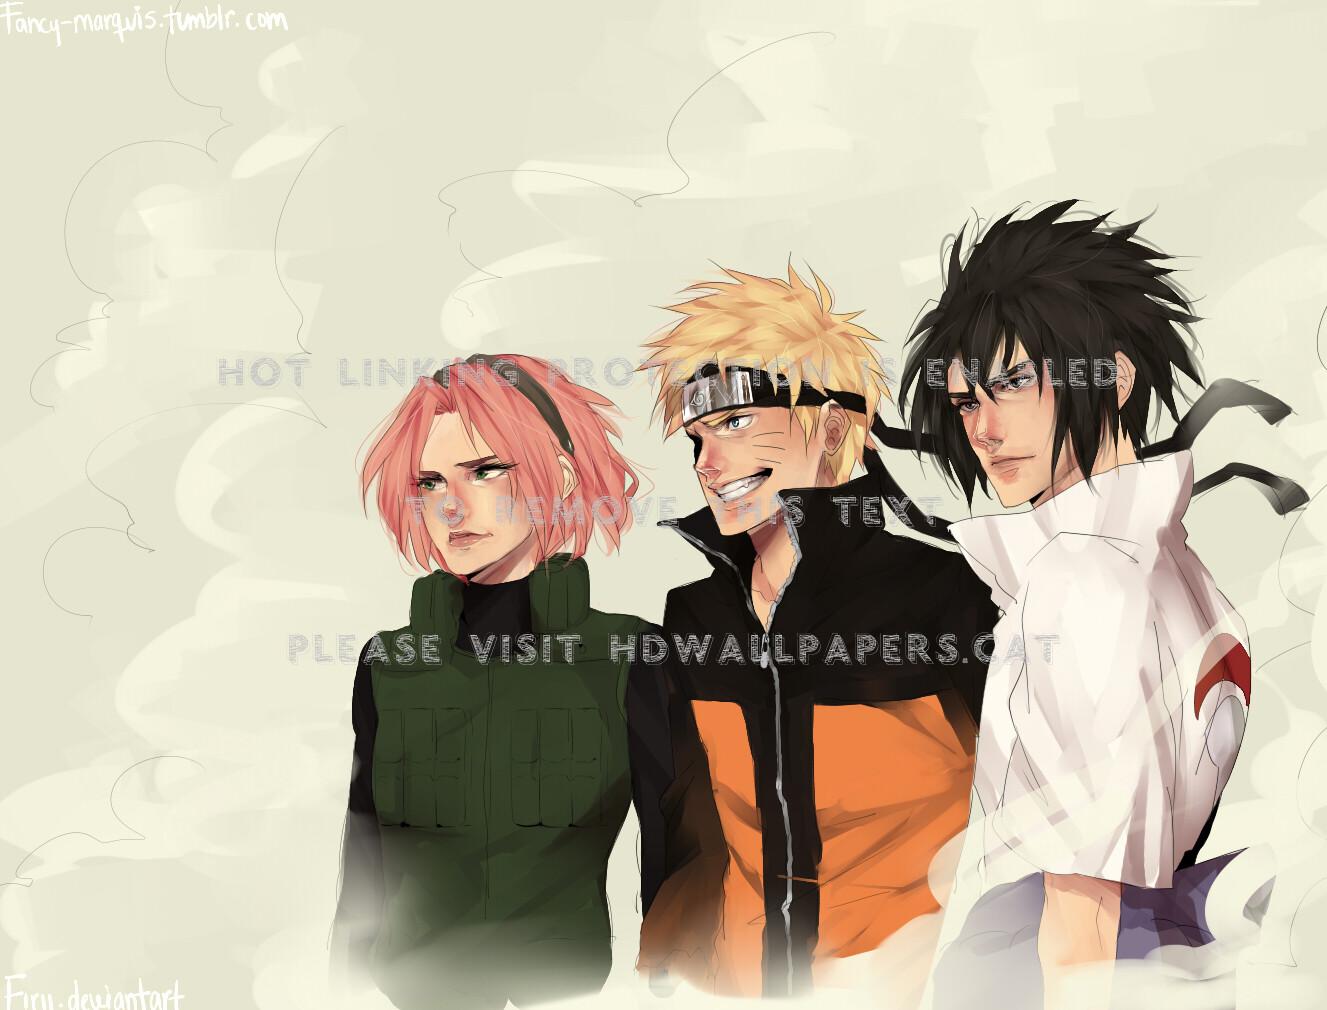 Anime Wallpaper Hd Naruto Team 7 Wallpaper Hd